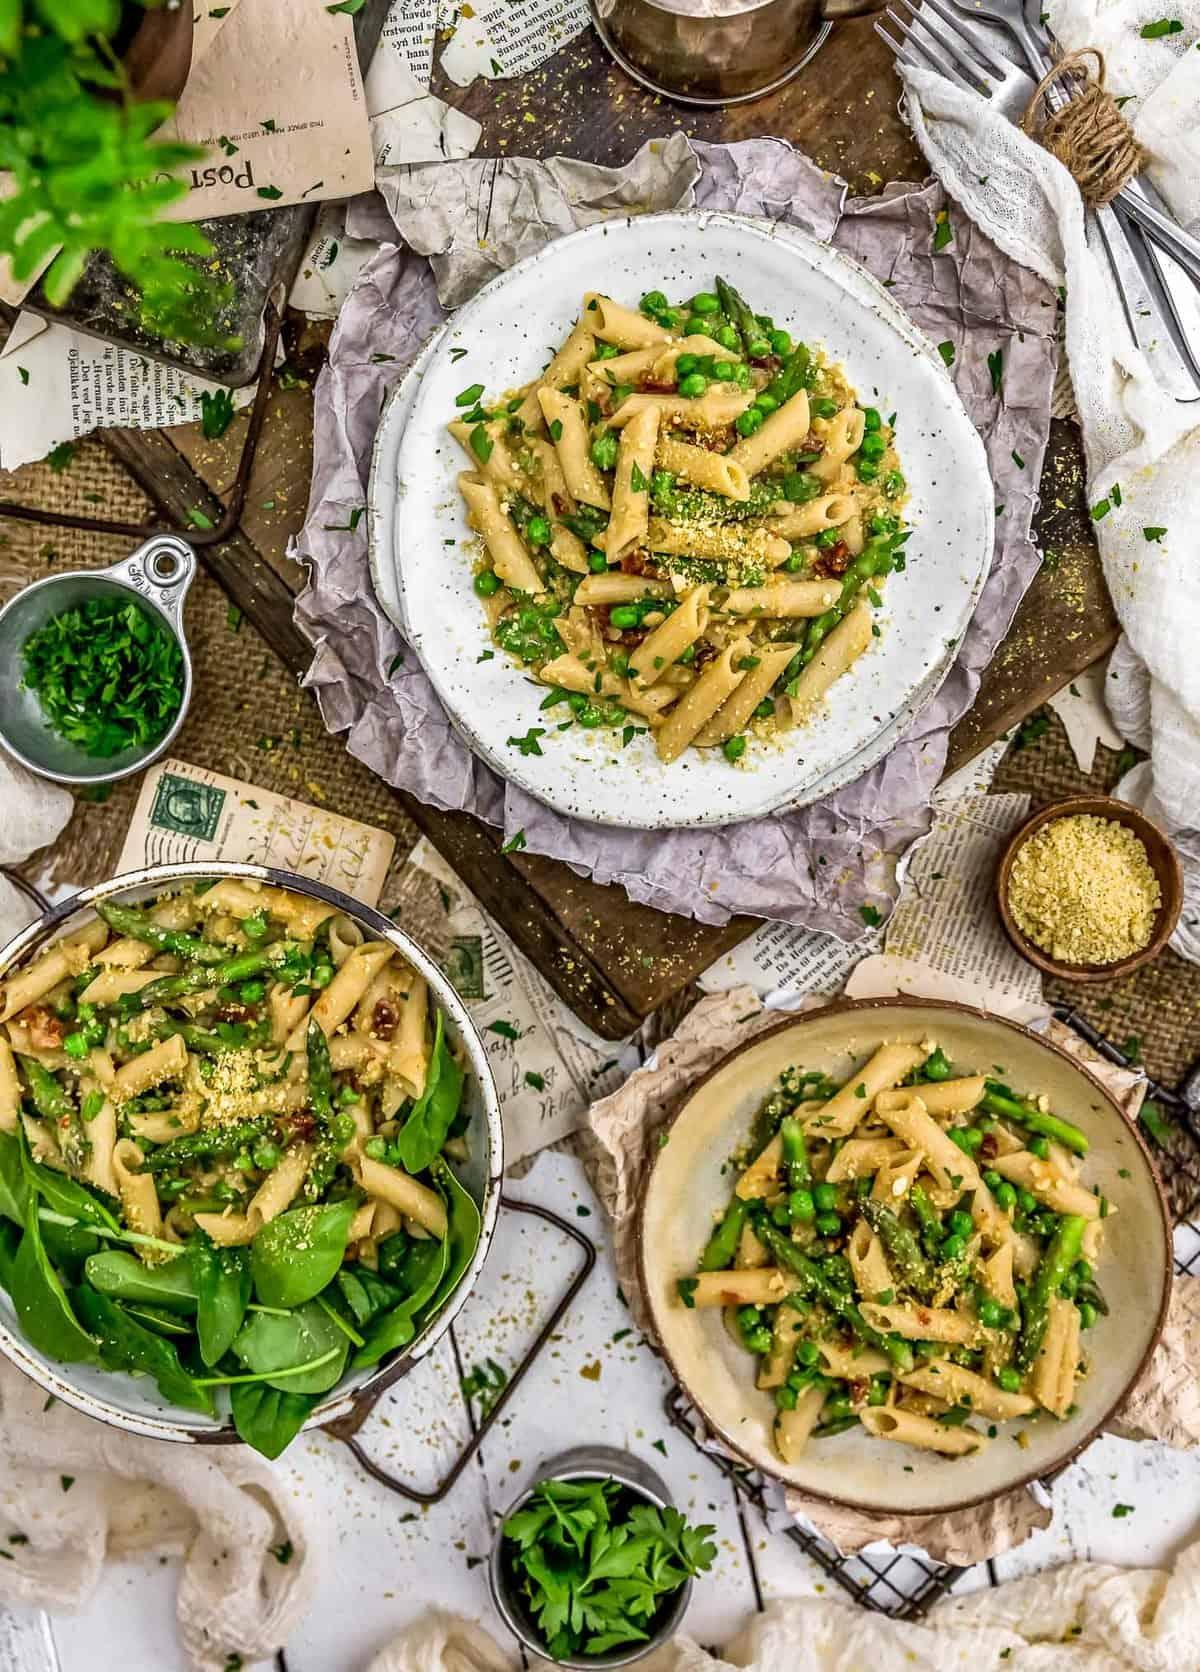 Tablescape of Vegan Carbonara Pasta